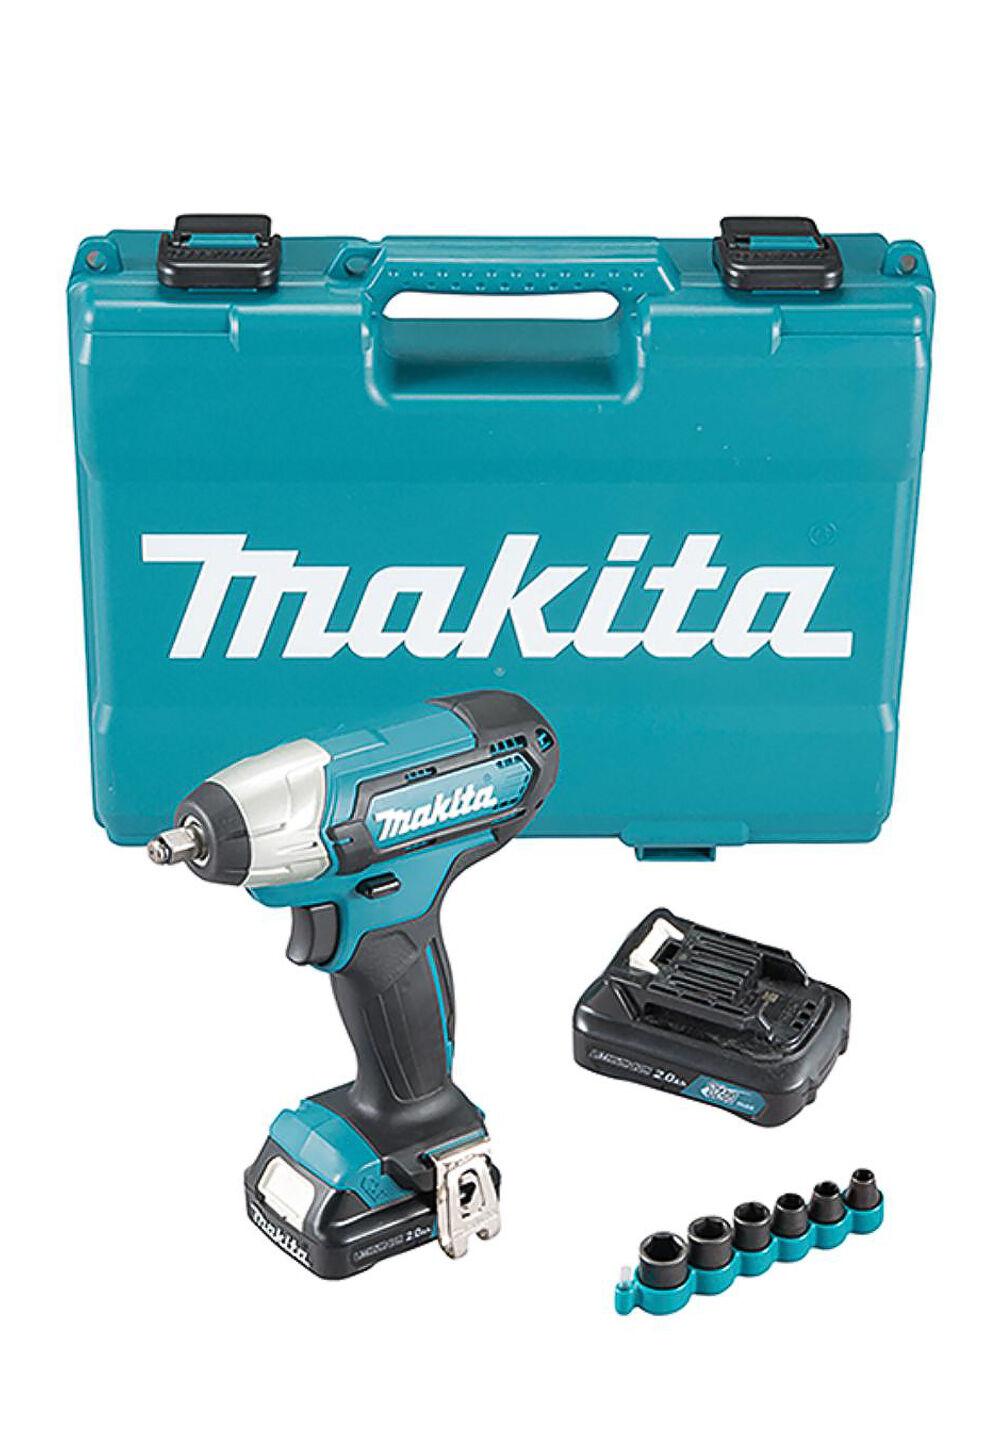 Makita Akku-Schlagschrauber-Set Tw140Dsaex, 5-teilig